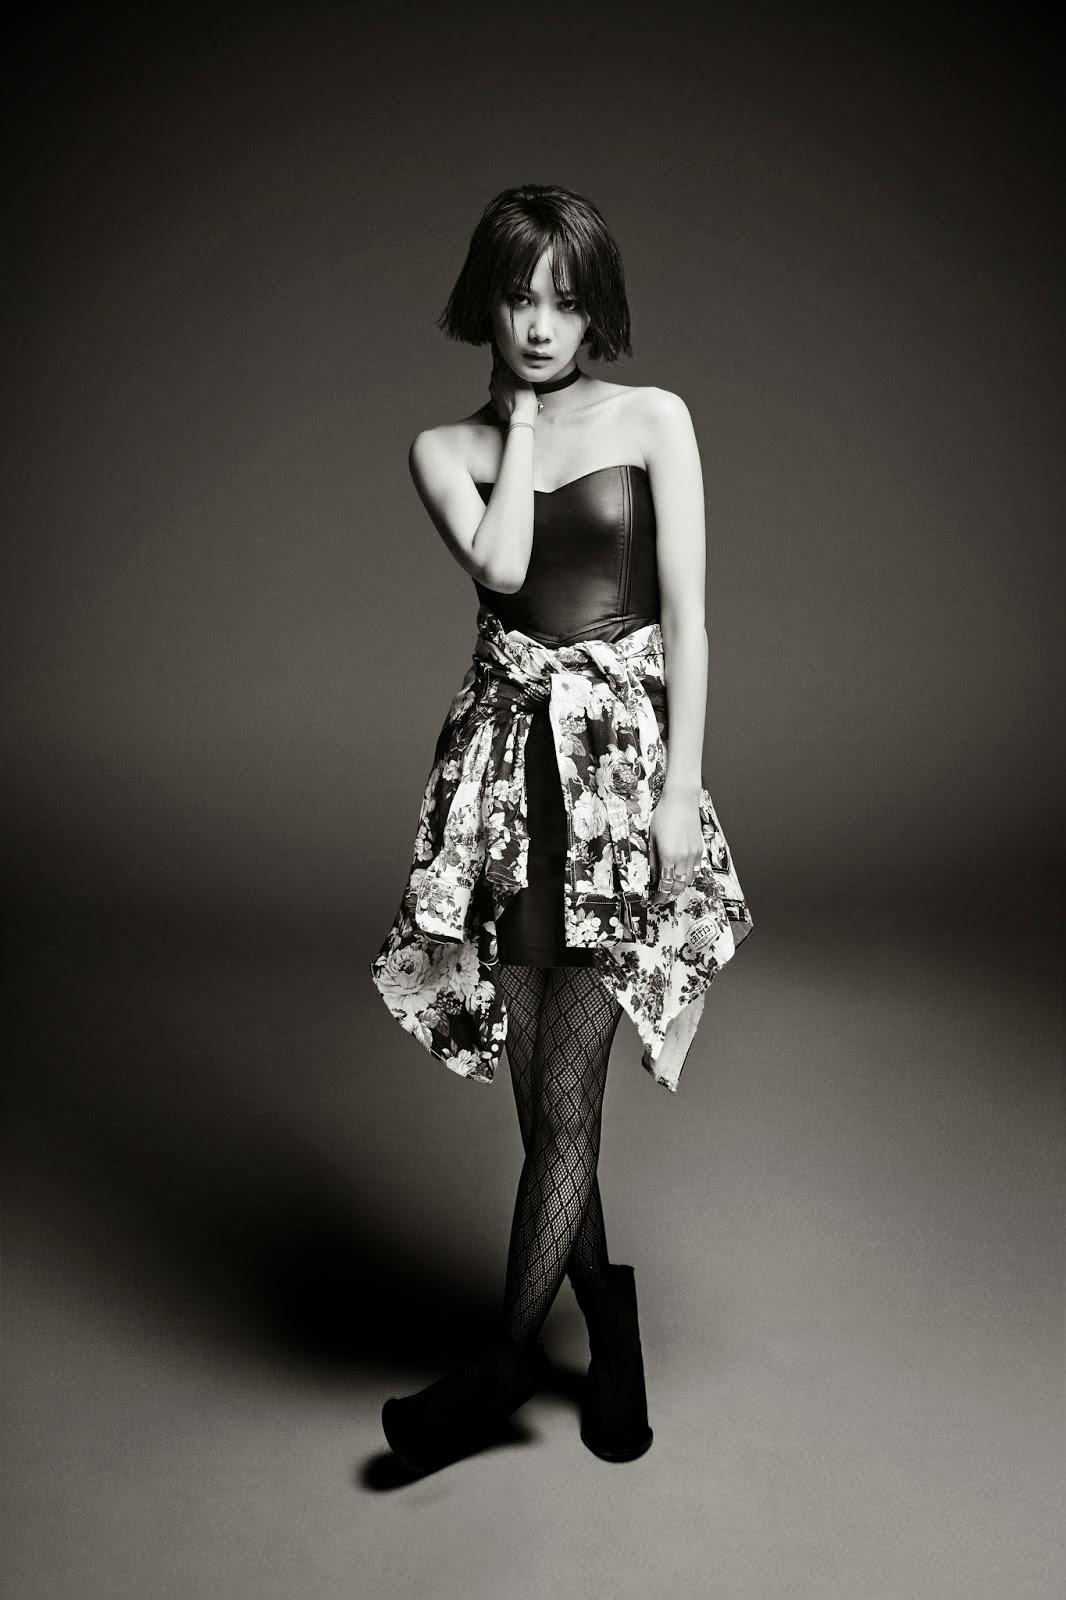 Yoon Seung Ah - The Celebrity Magazine MYoon Seung Ah - The Celebrity Magazine March Issue 2014zarch Issue 2014